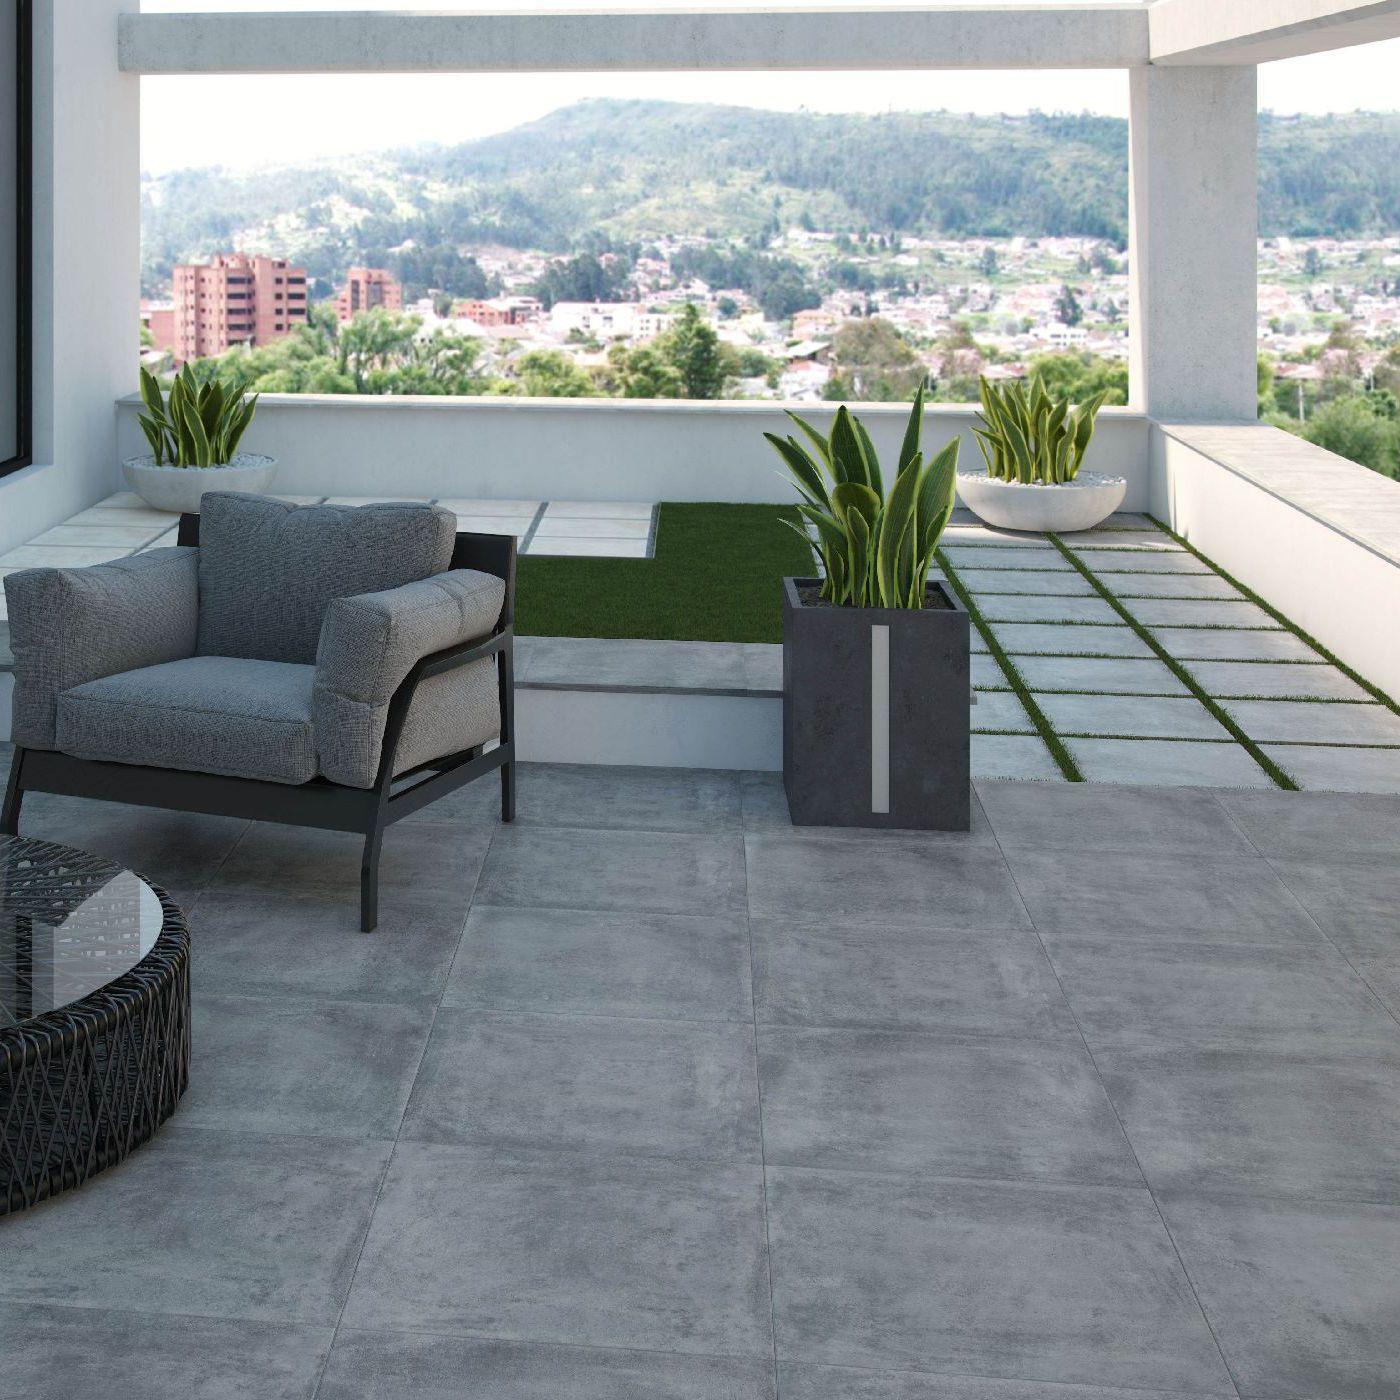 Outdoor tile floor porcelain stoneware plain exterior outdoor tile floor porcelain stoneware plain exterior dailygadgetfo Gallery